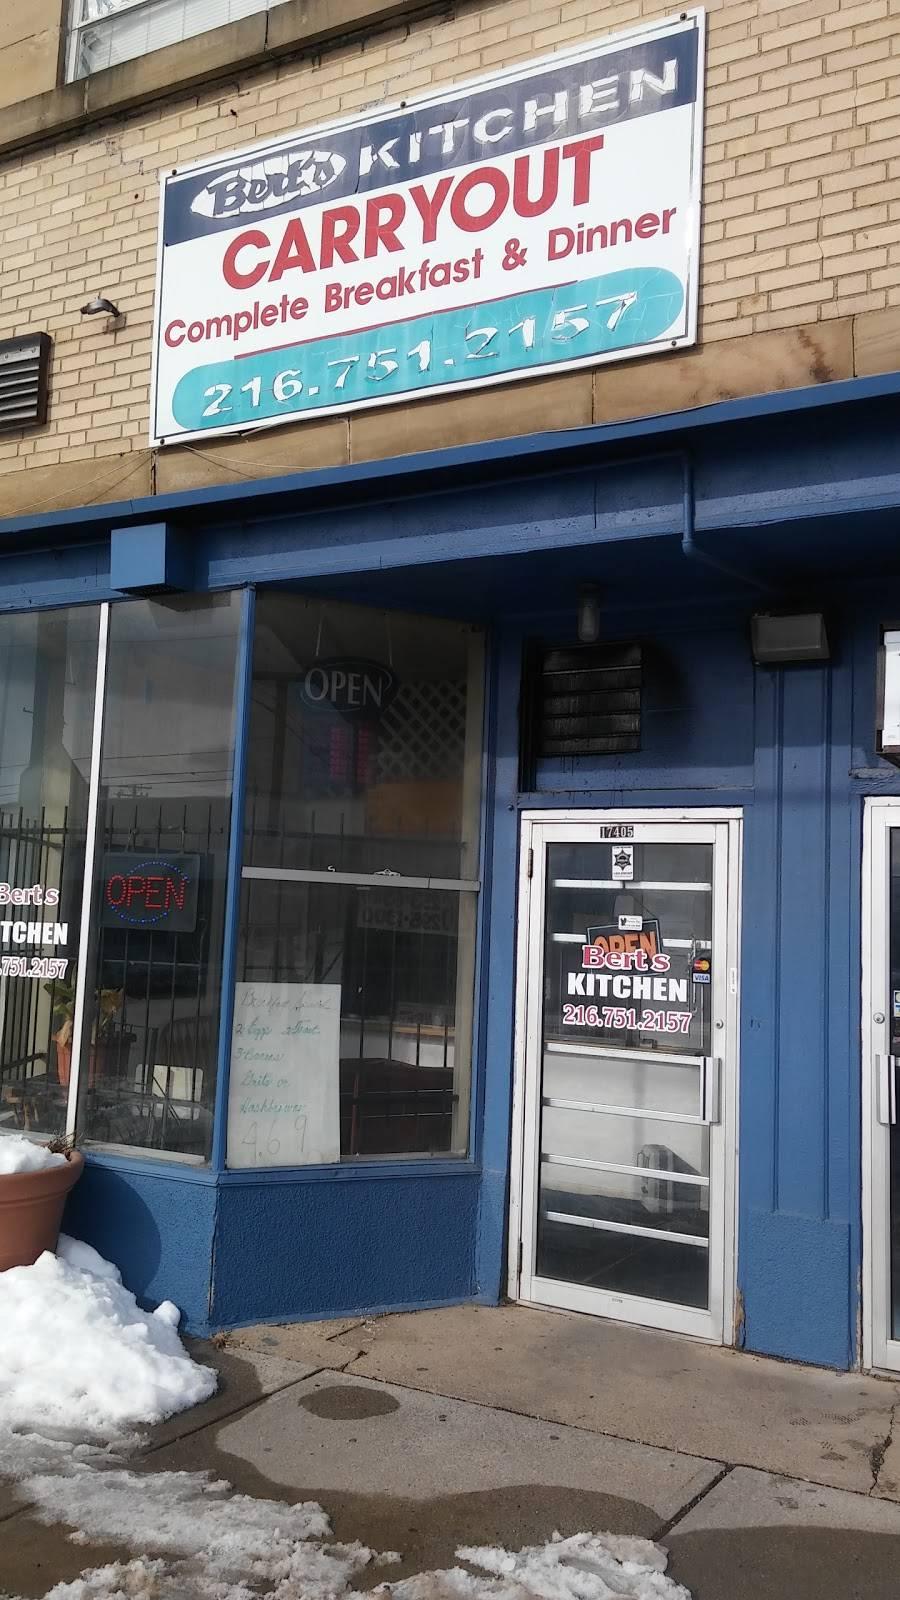 Berts Kitchen   restaurant   17405 Harvard Ave, Cleveland, OH 44128, USA   2167512157 OR +1 216-751-2157